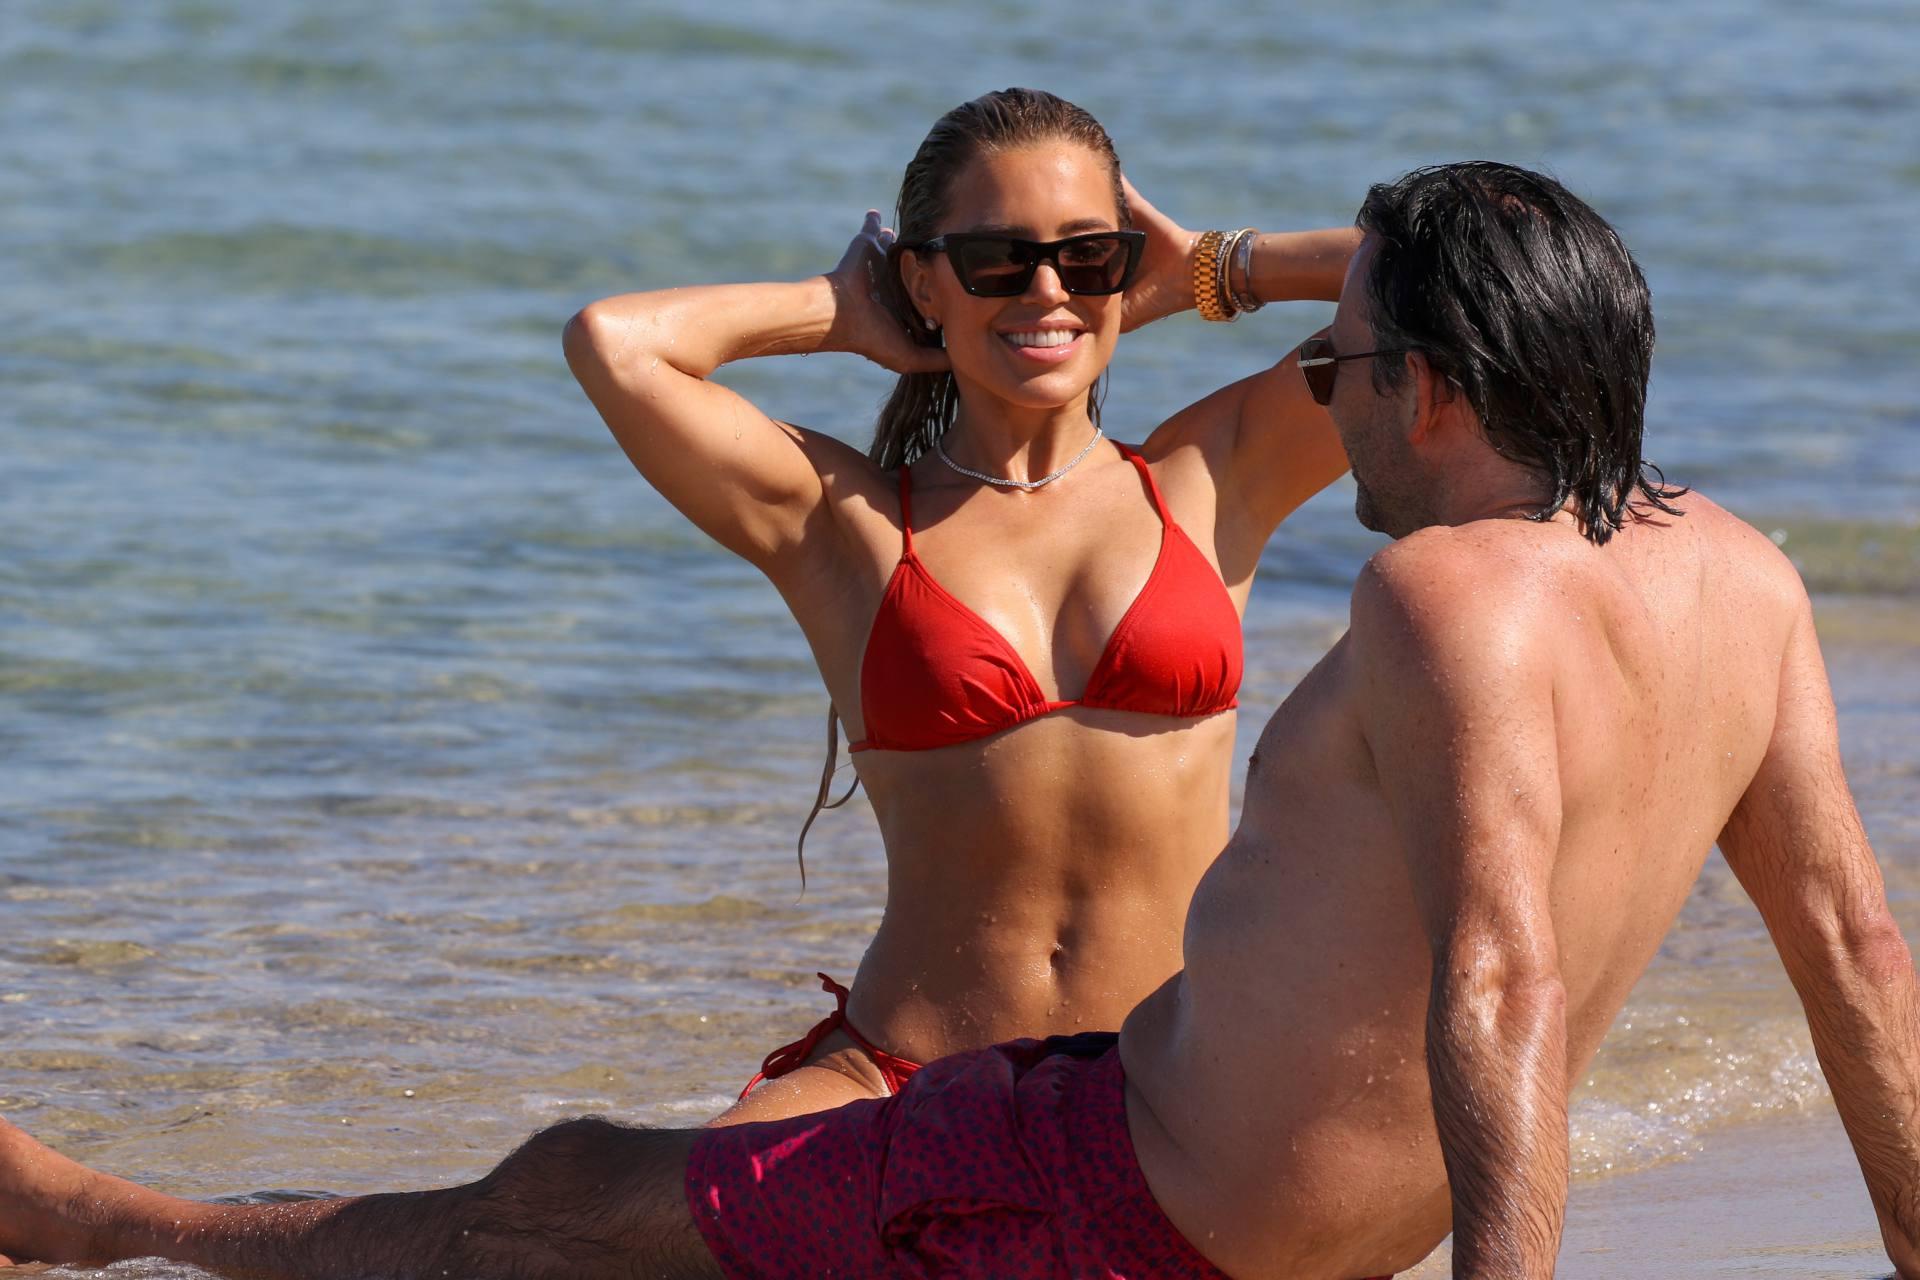 Sylvie Meis – Beautiful Body In Sexy Bikini On The Beach In Saint Tropez 0027